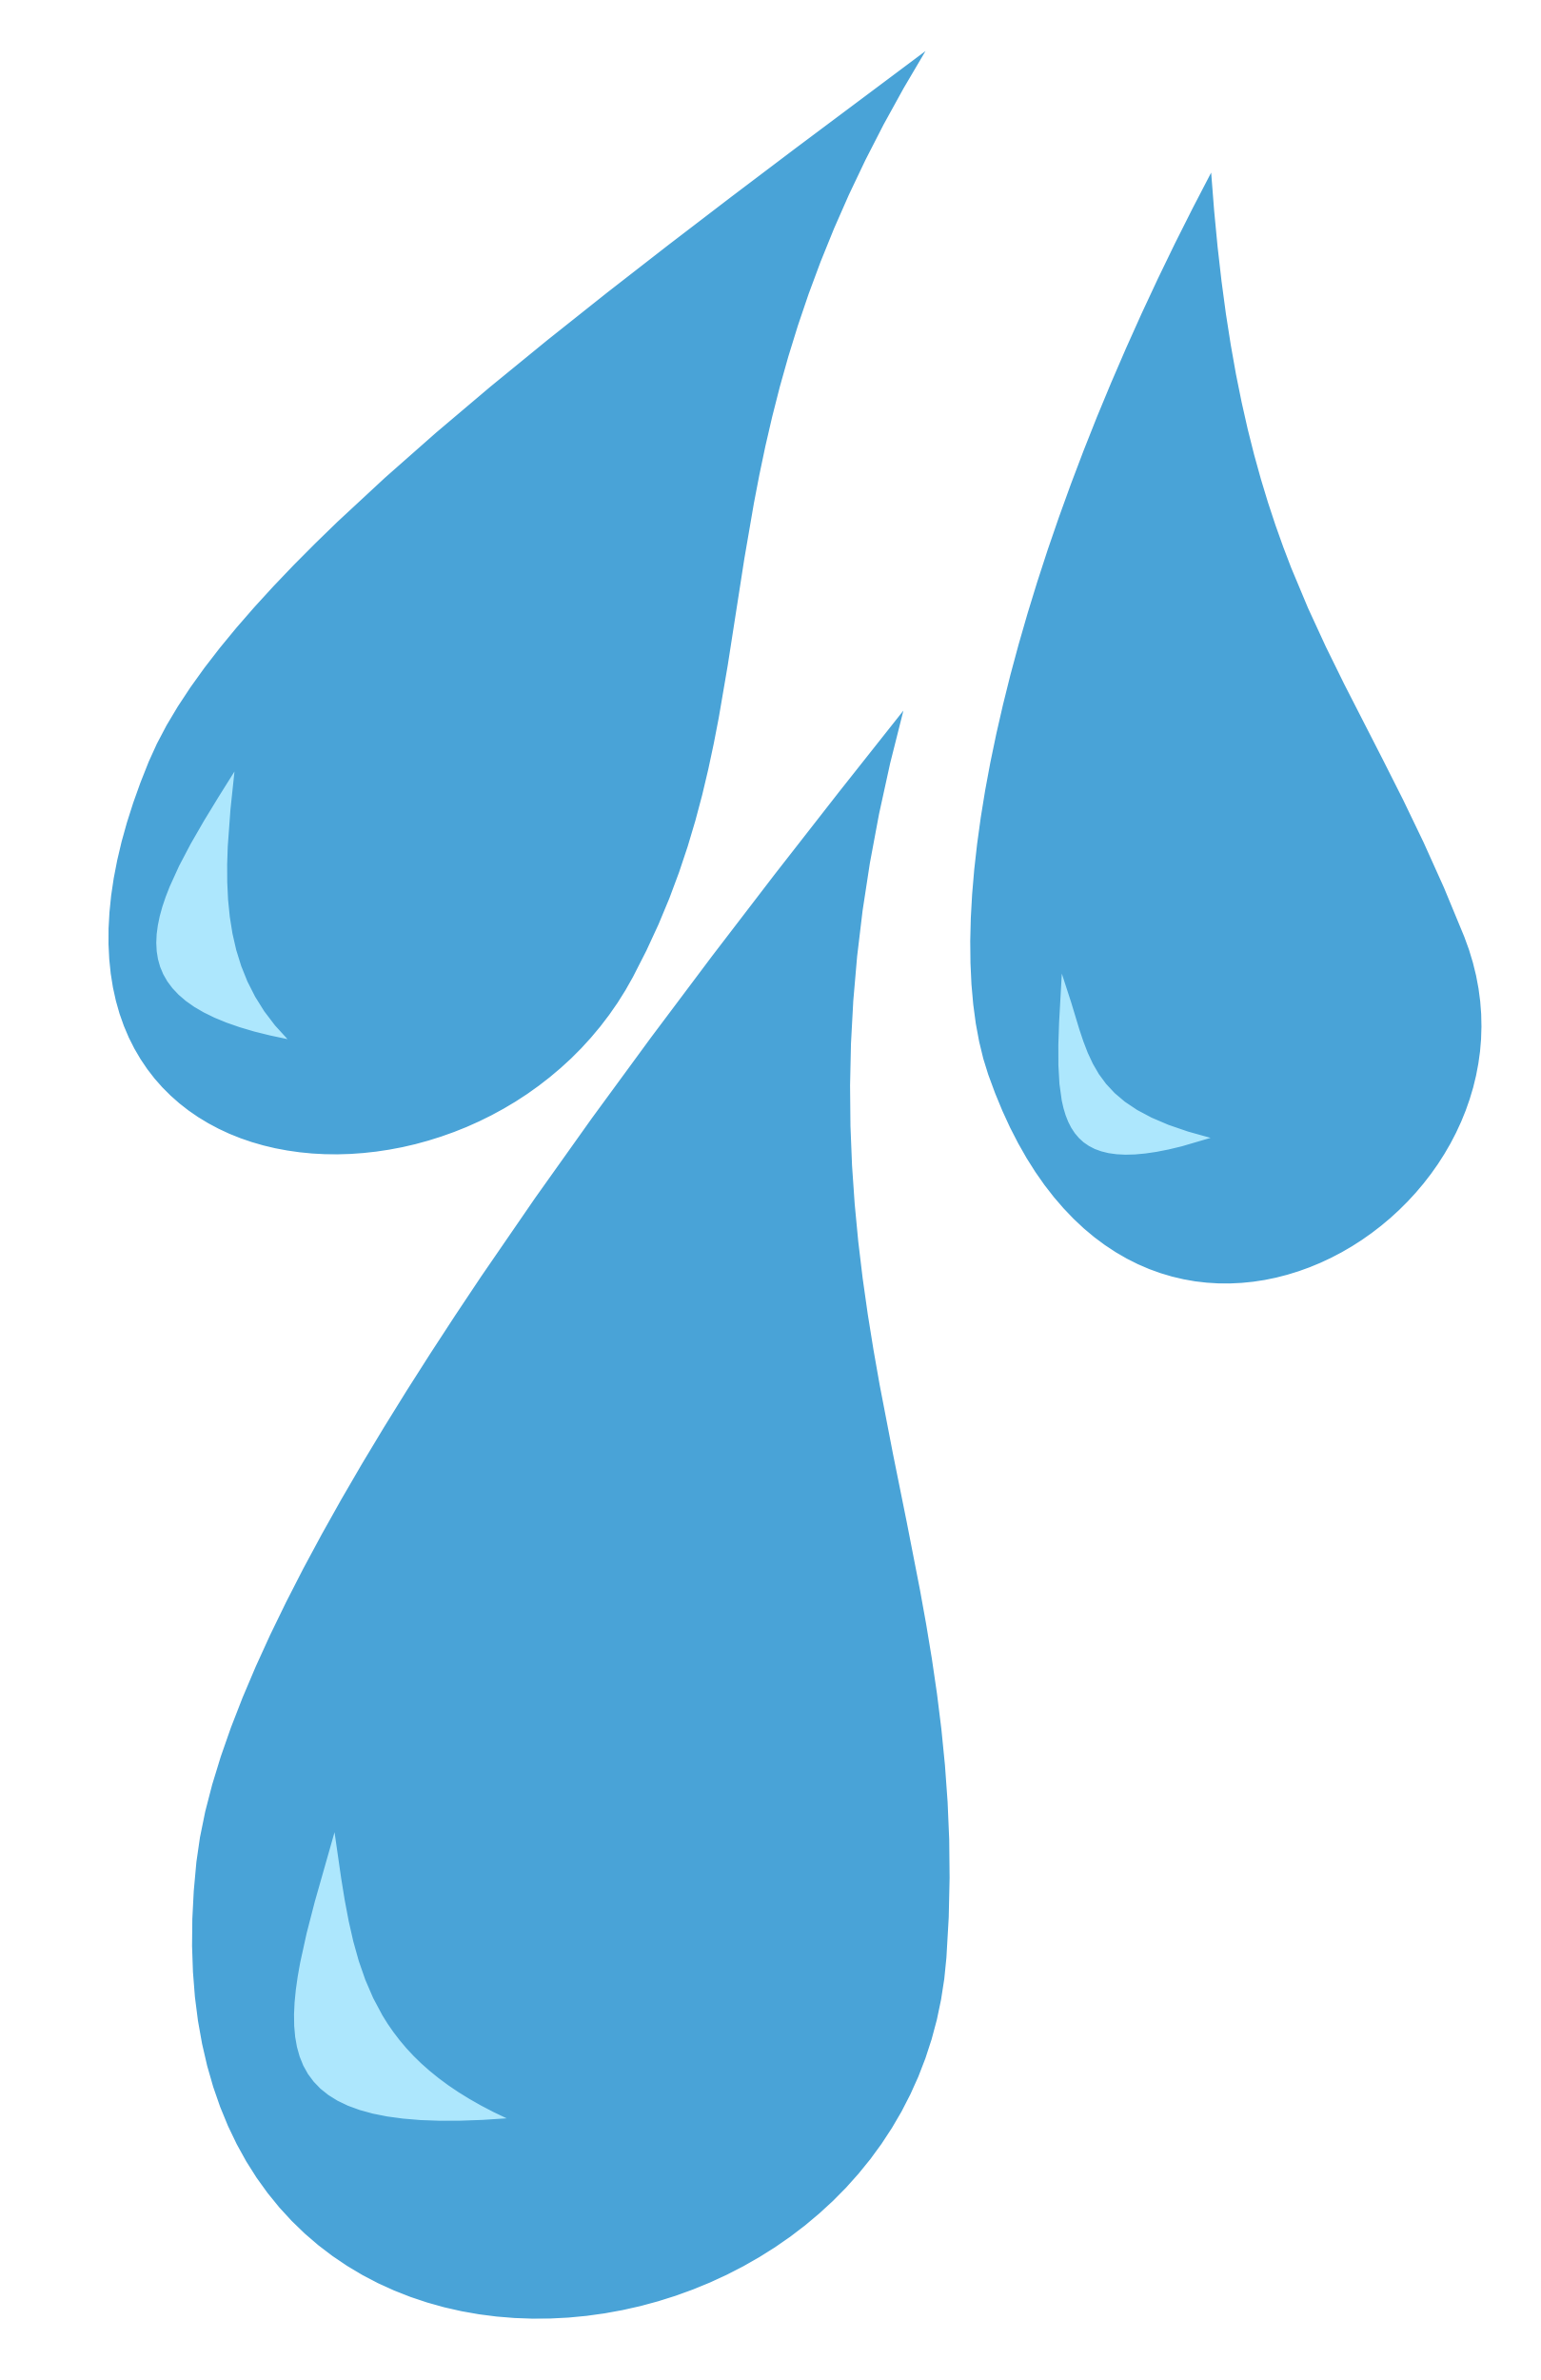 Raindrops cutie mark